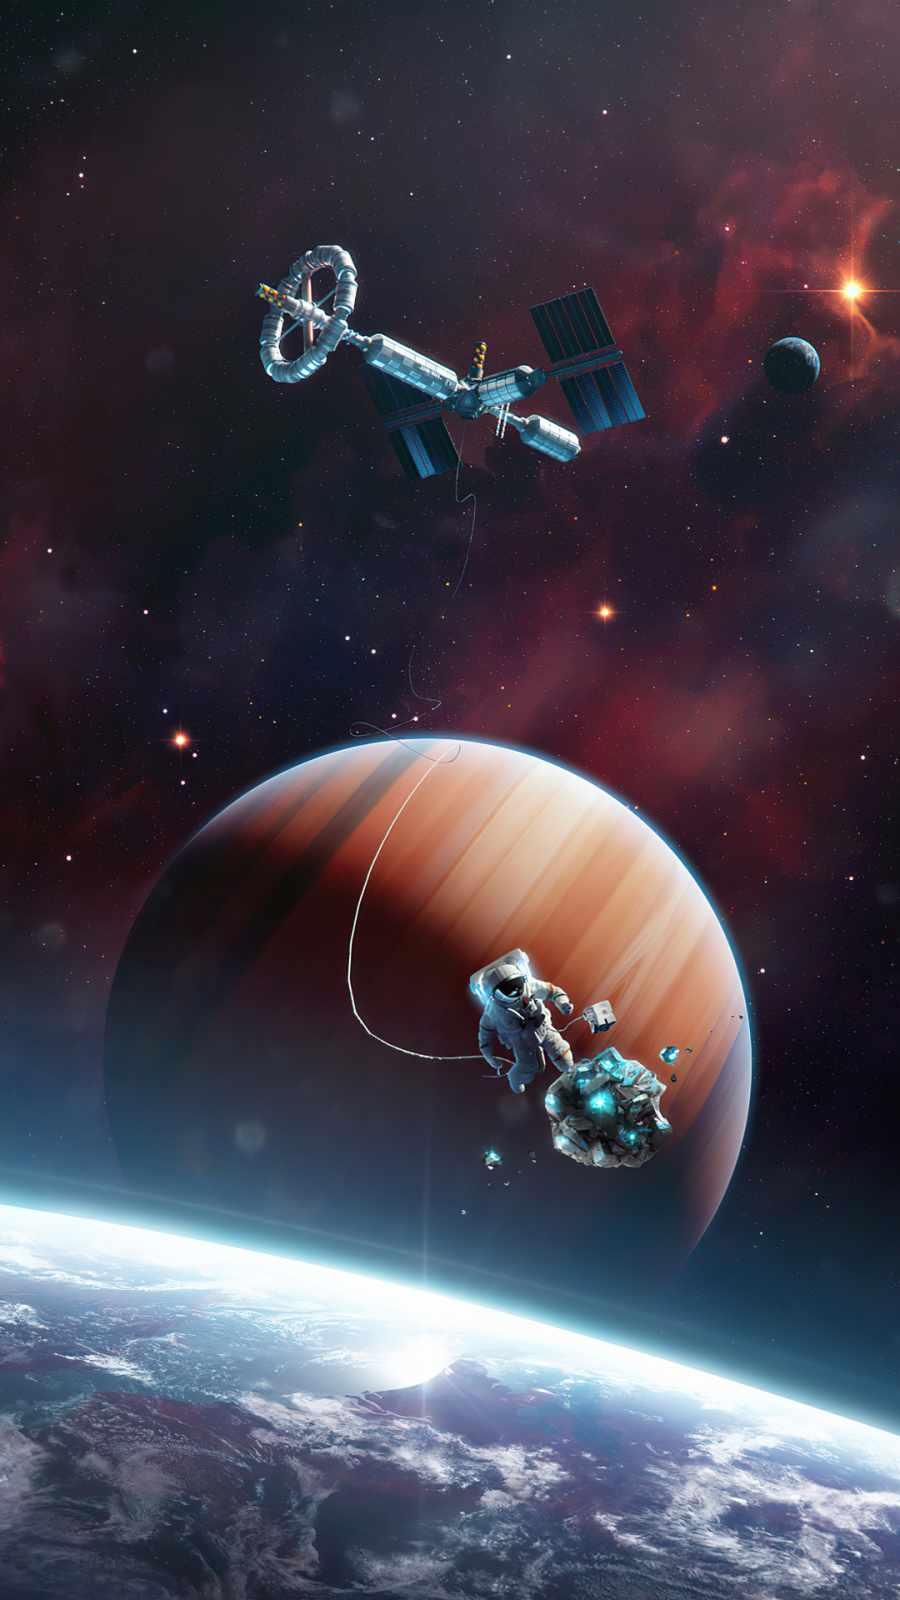 Astronaut left station